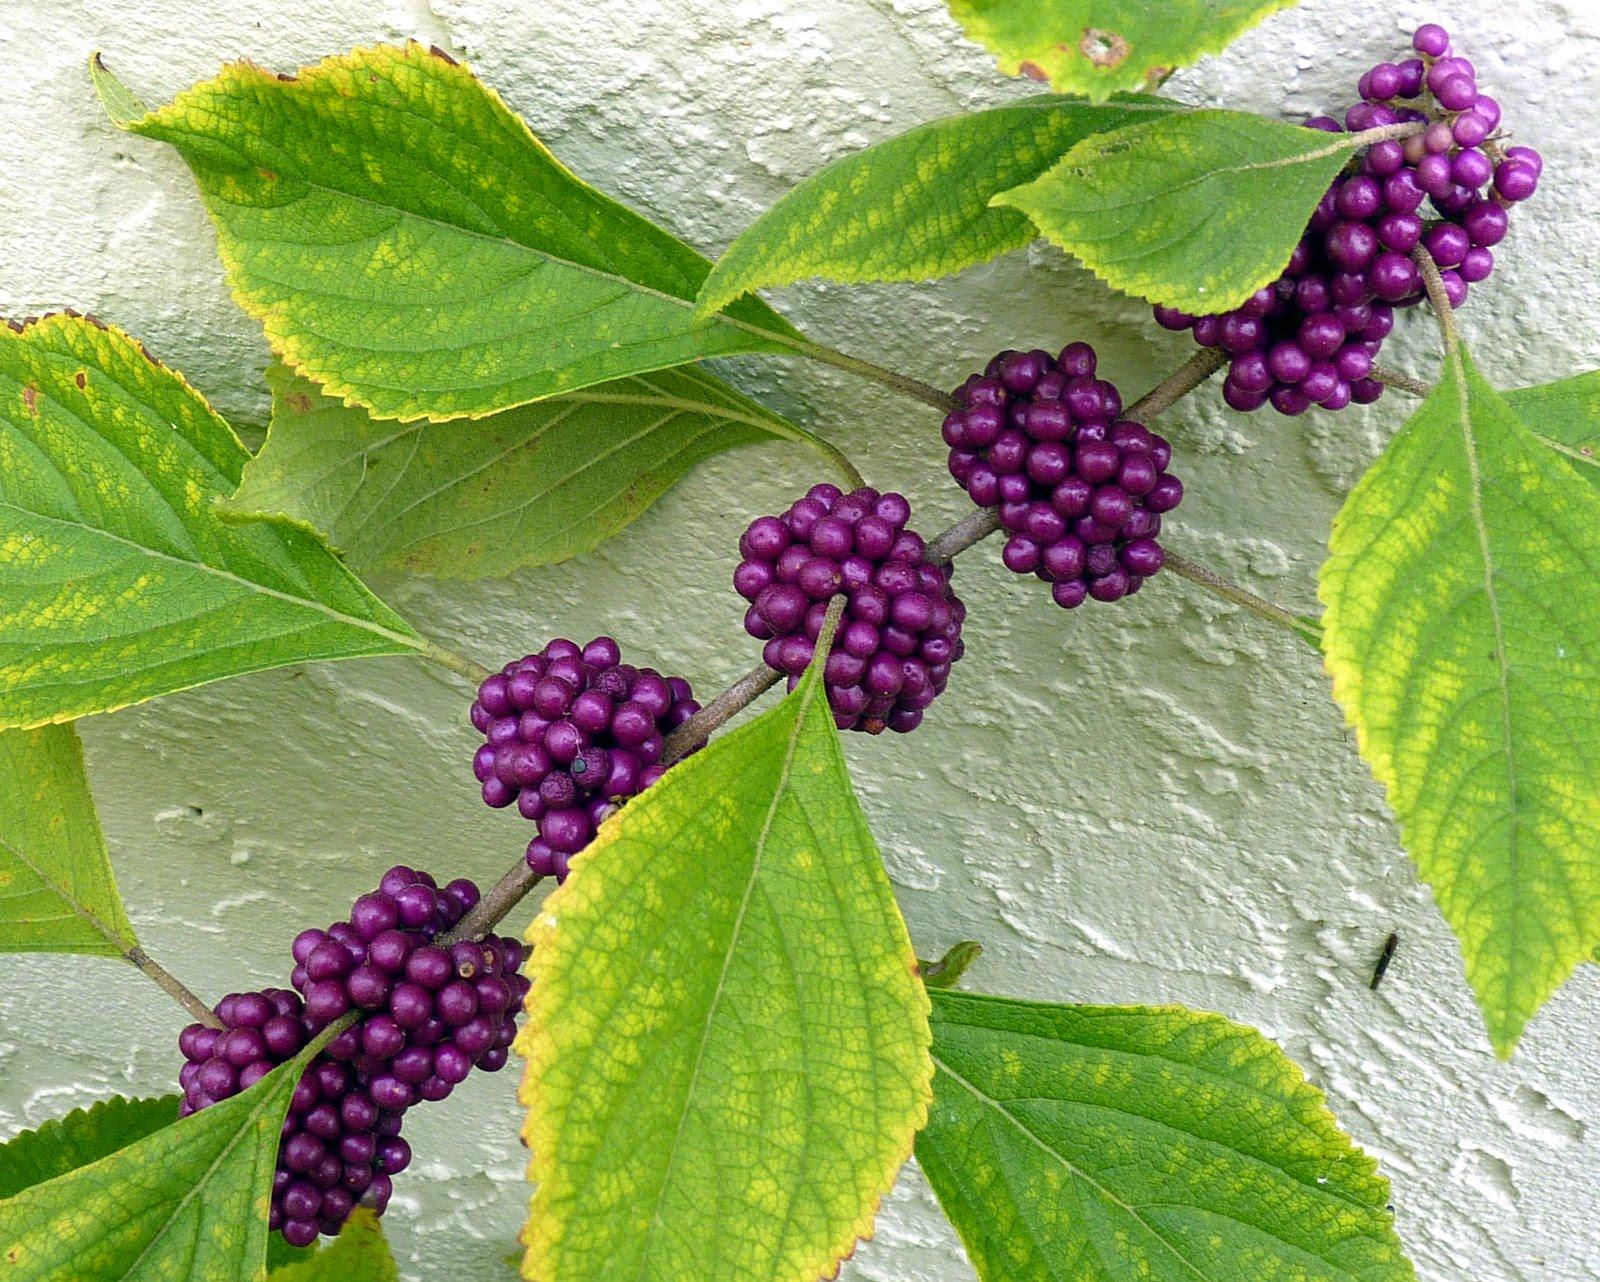 Bush With Purple Berries